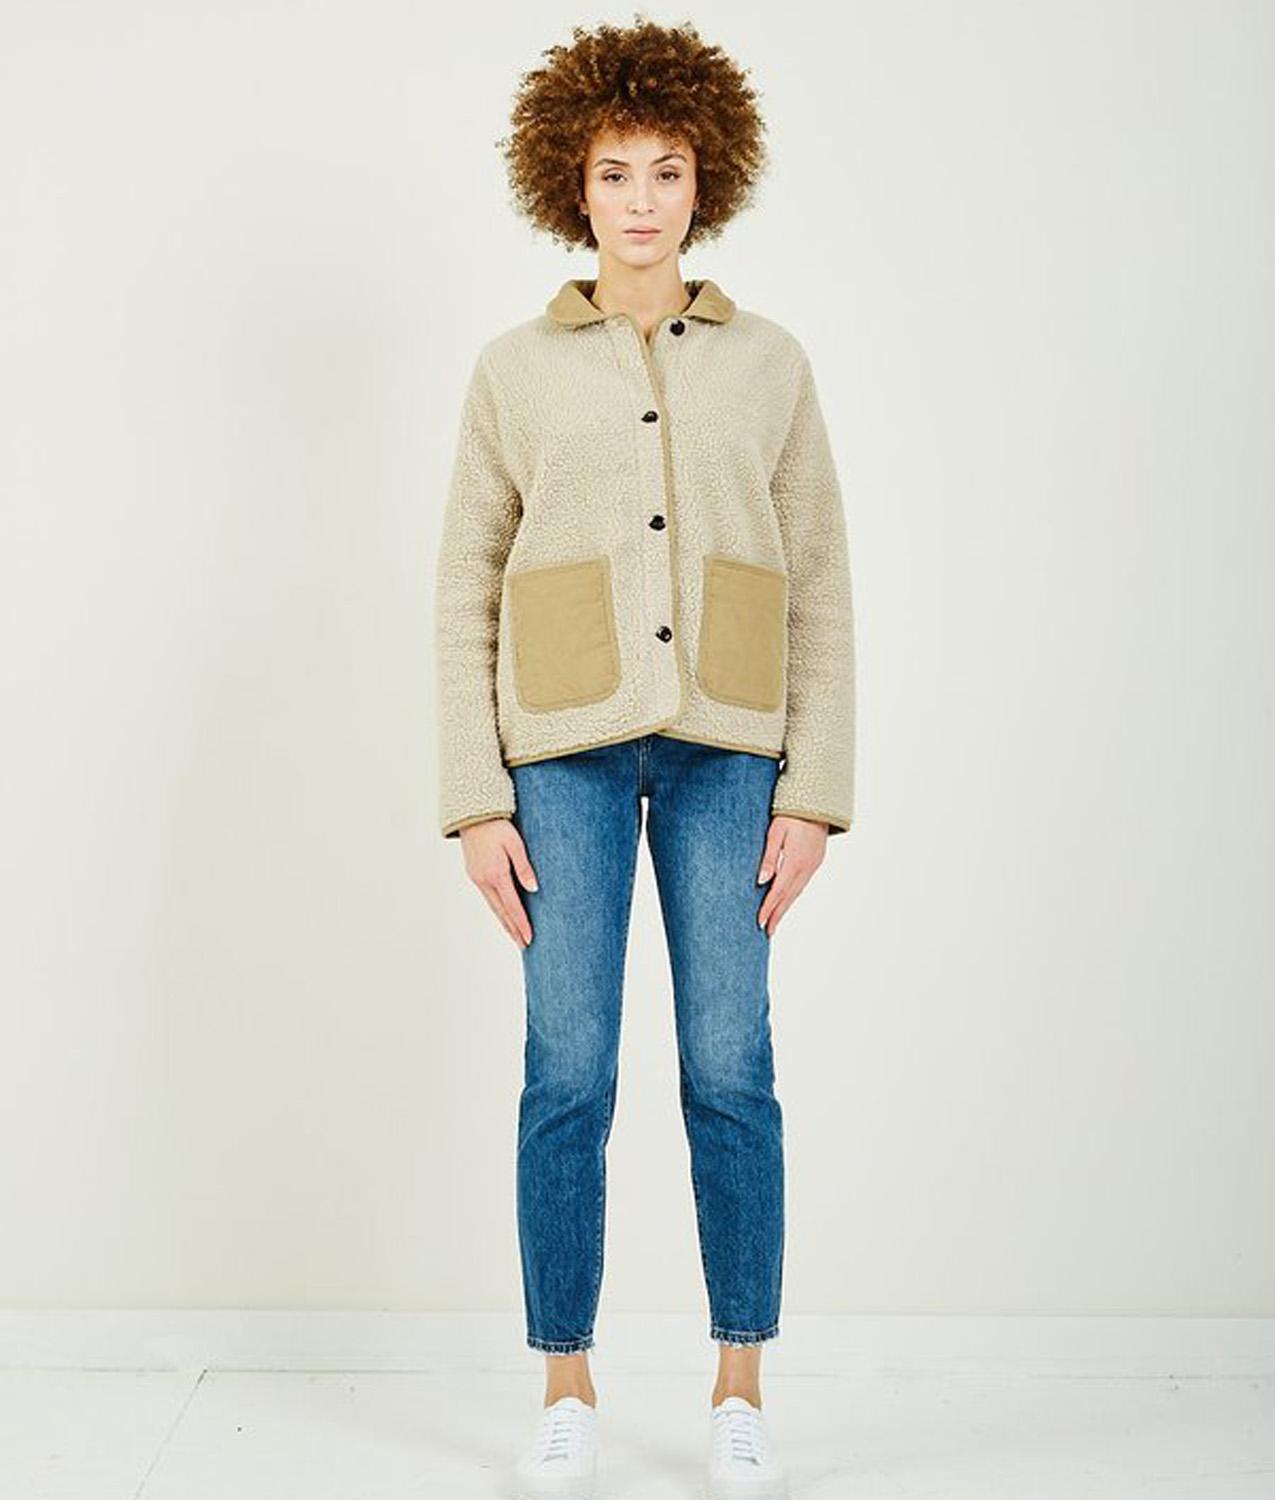 Alex Mill Sherpa Fleece Jacket Free Shipping Worldwide Poshmark makes shopping fun, affordable & easy! alex mill sherpa fleece jacket